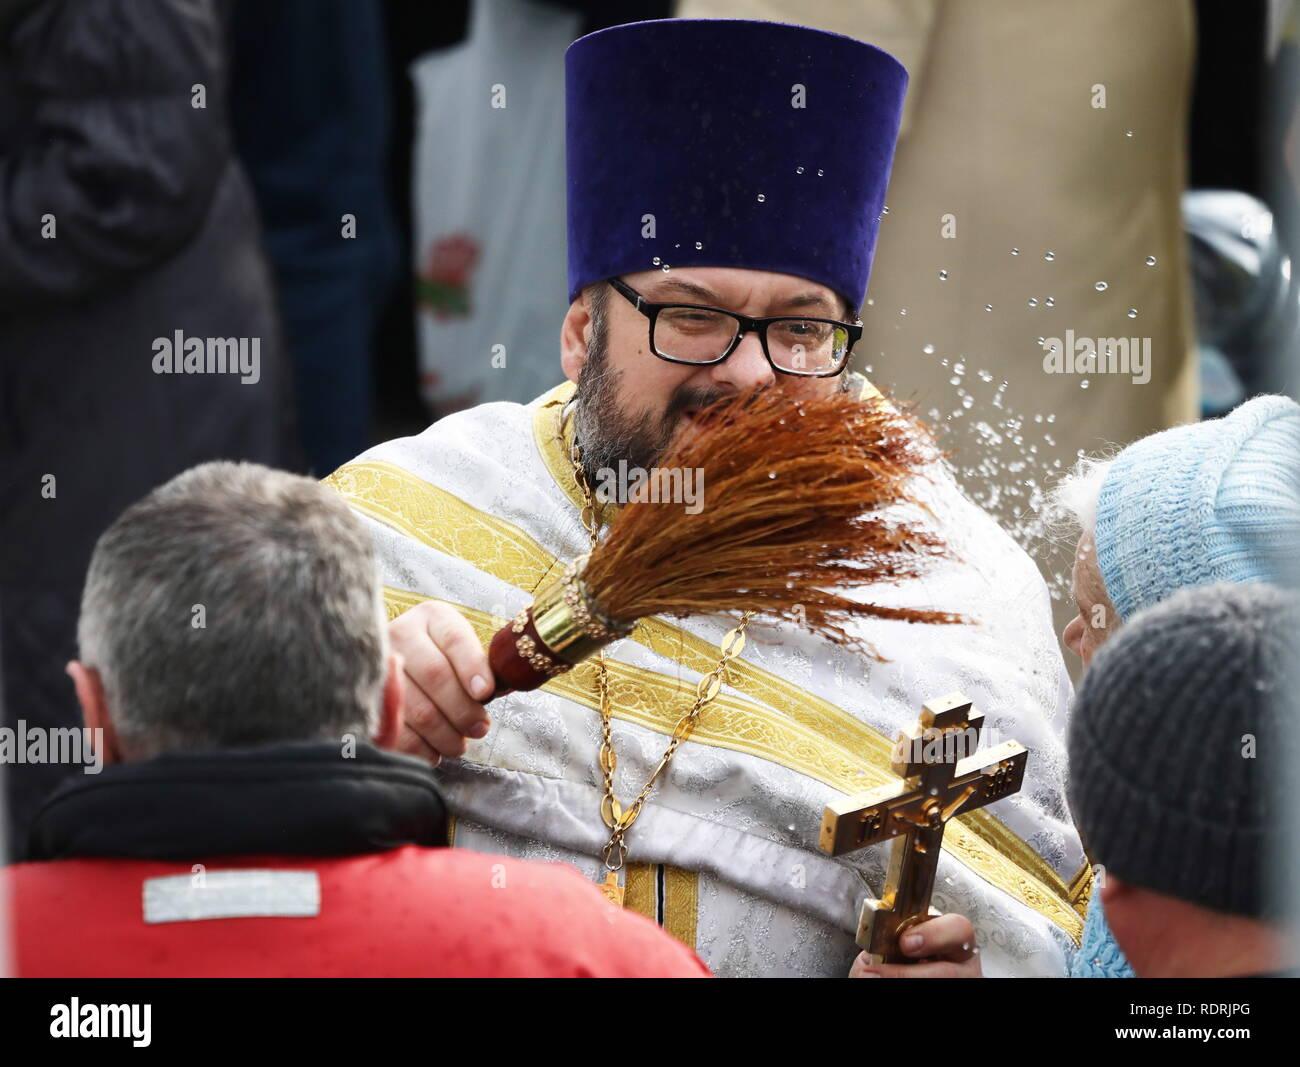 Sudak Russland Jan 2019 19 Krim Russland Januar 19